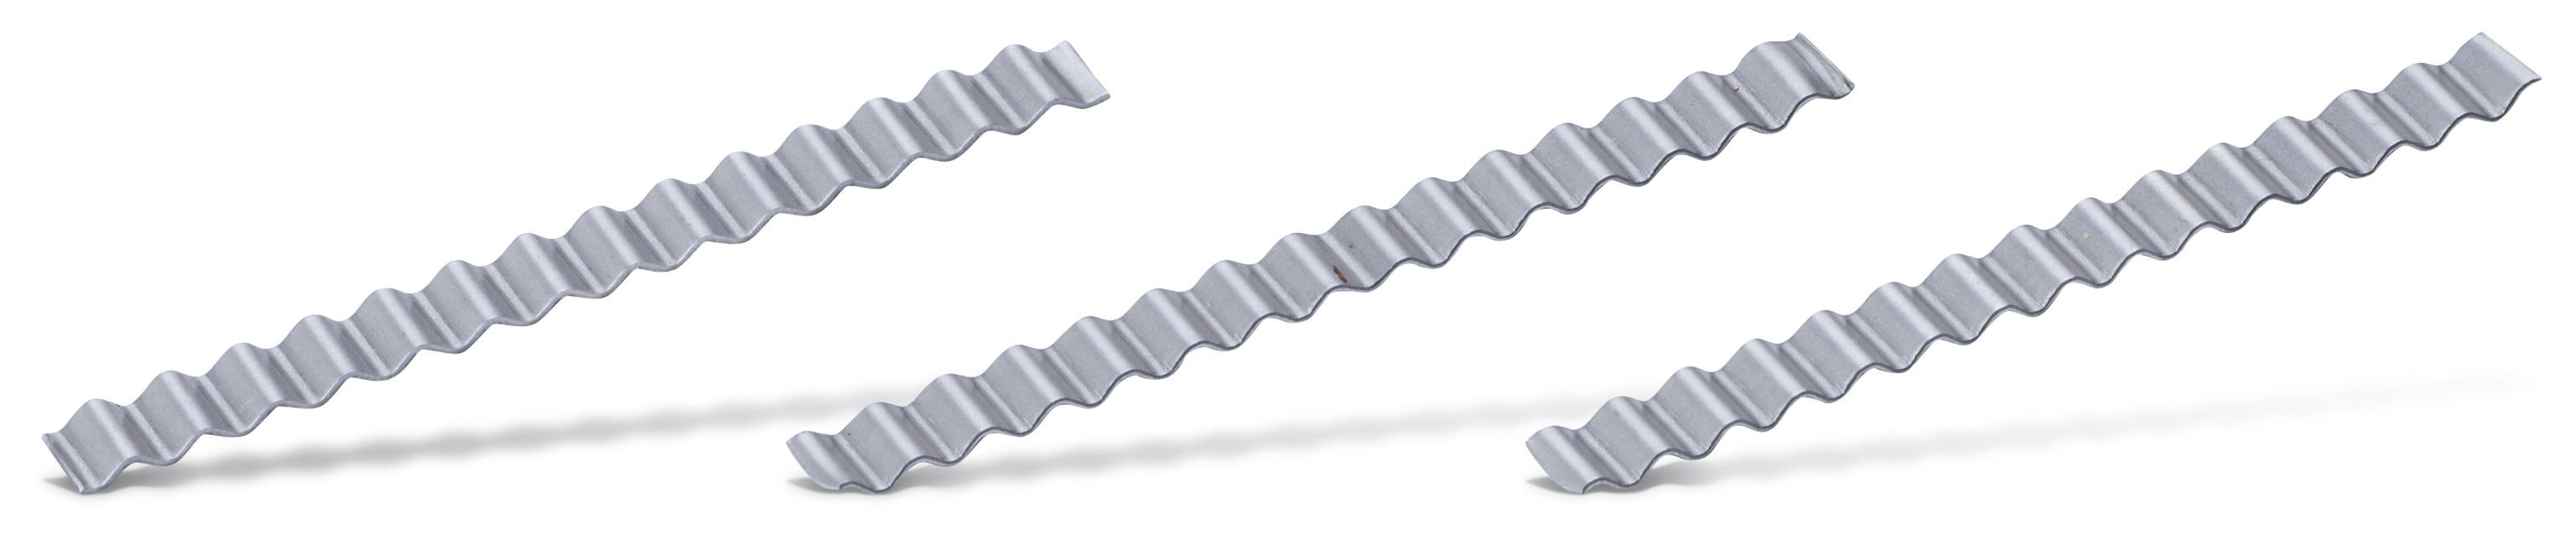 Wellenverbinder Pajarito